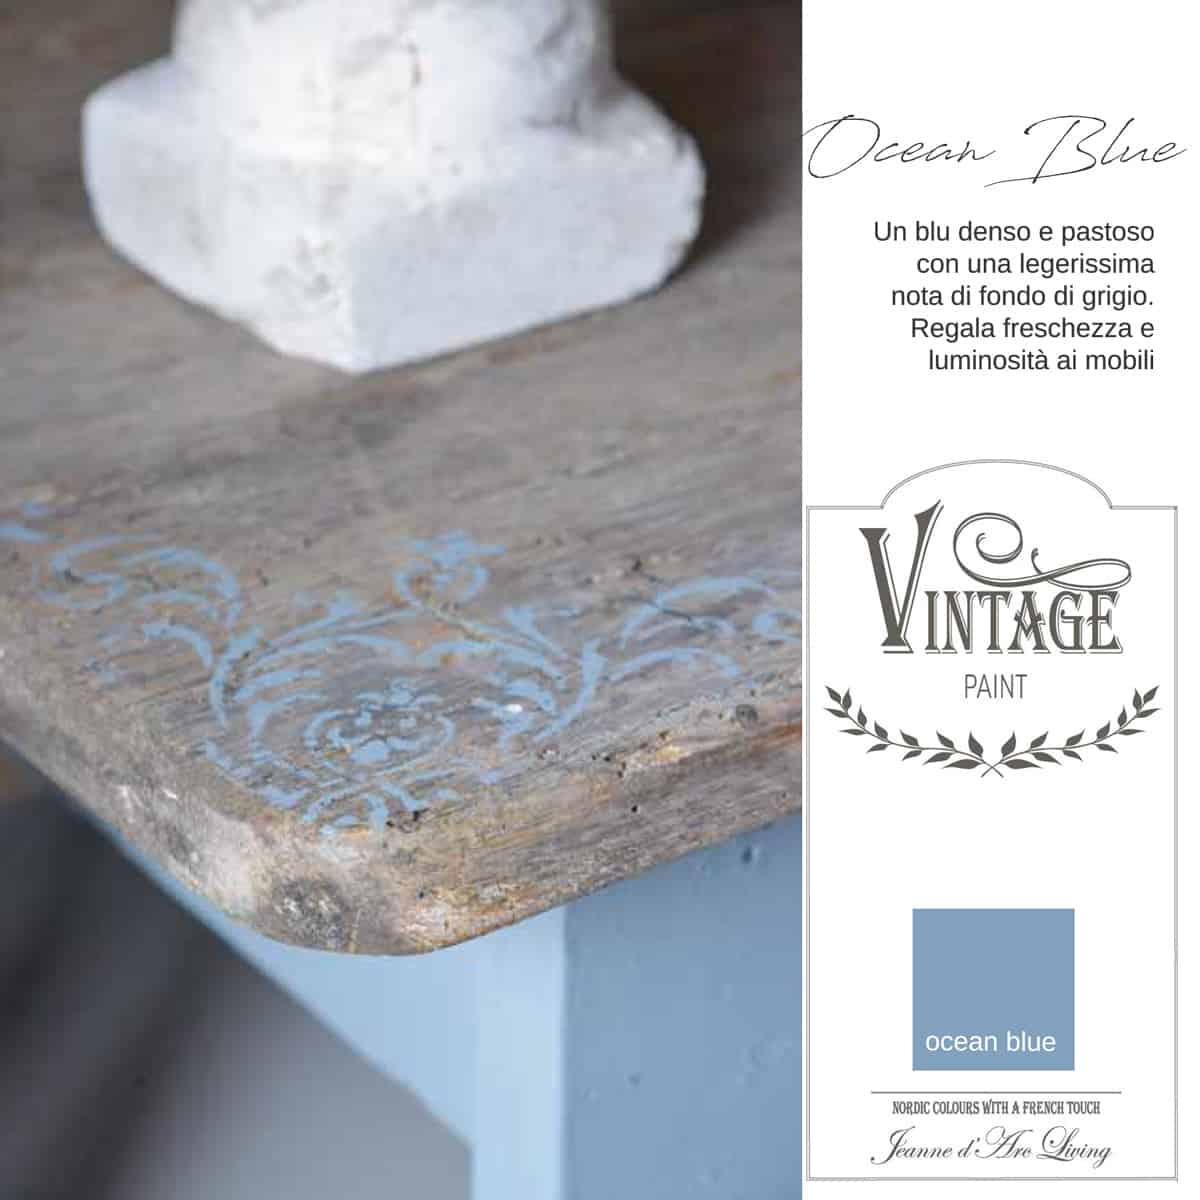 ocean blue blu azzurro vintage chalk paint vernici shabby chic autentico look gesso